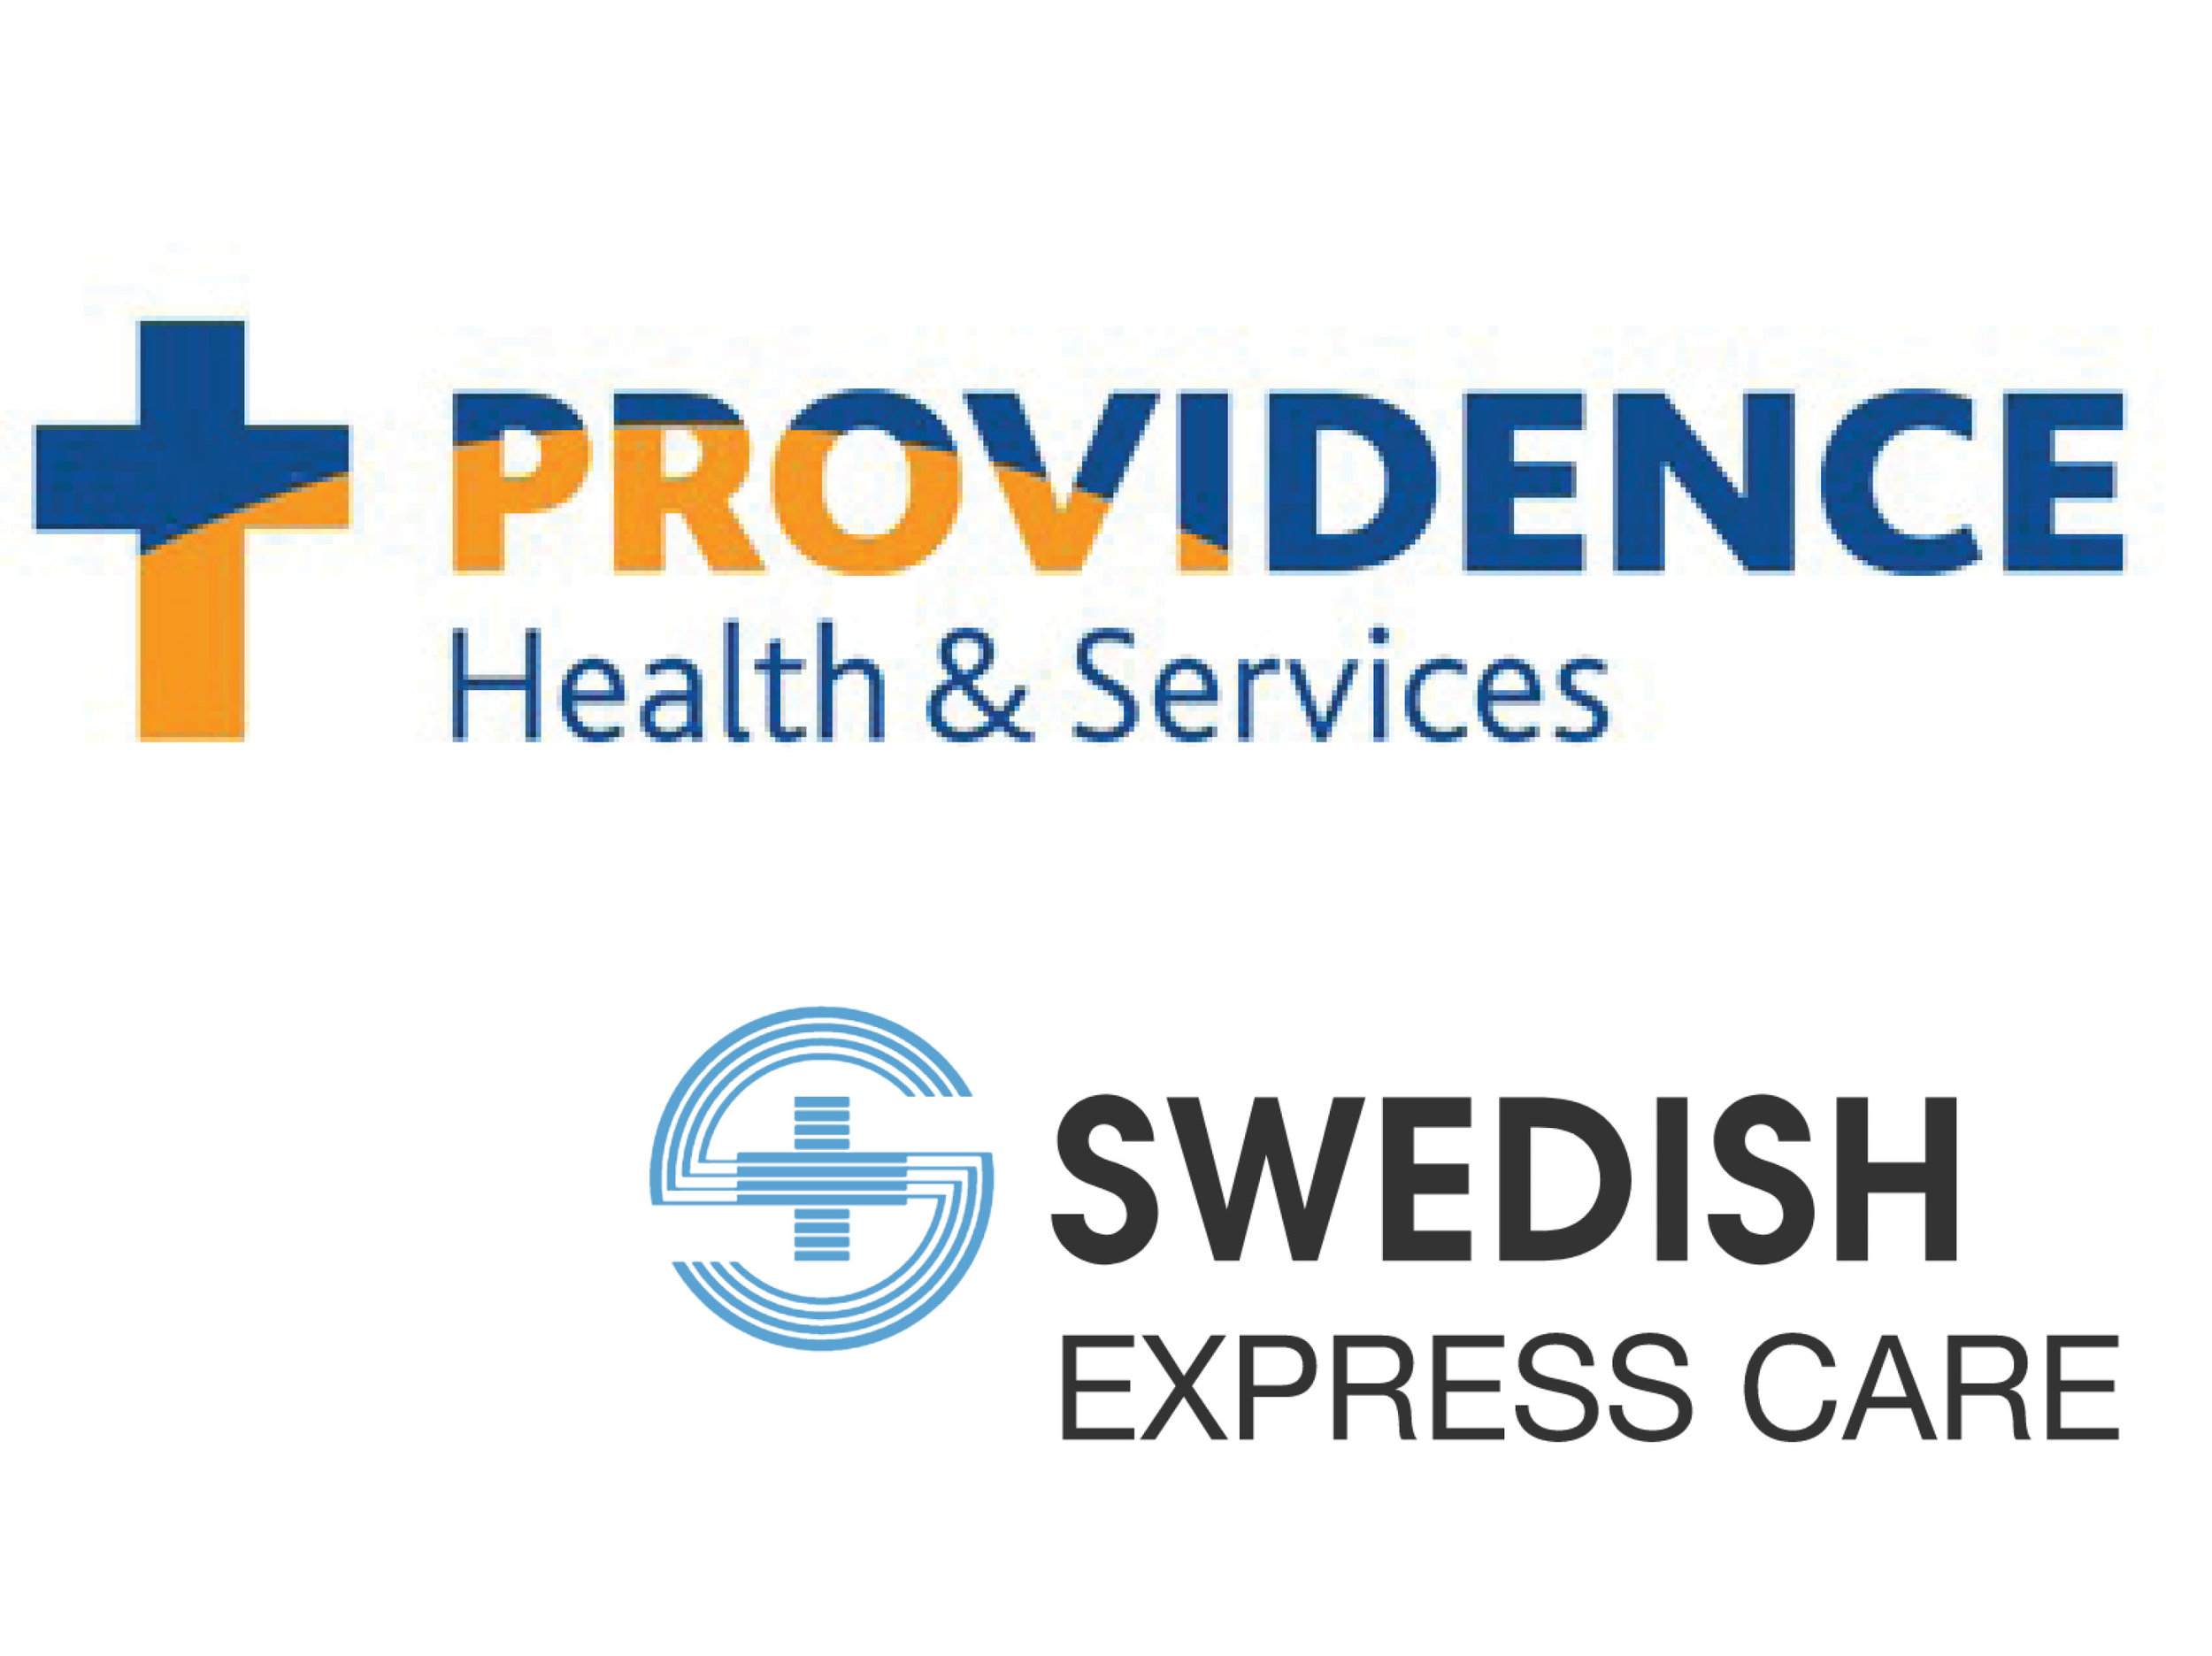 Providence & Swedish